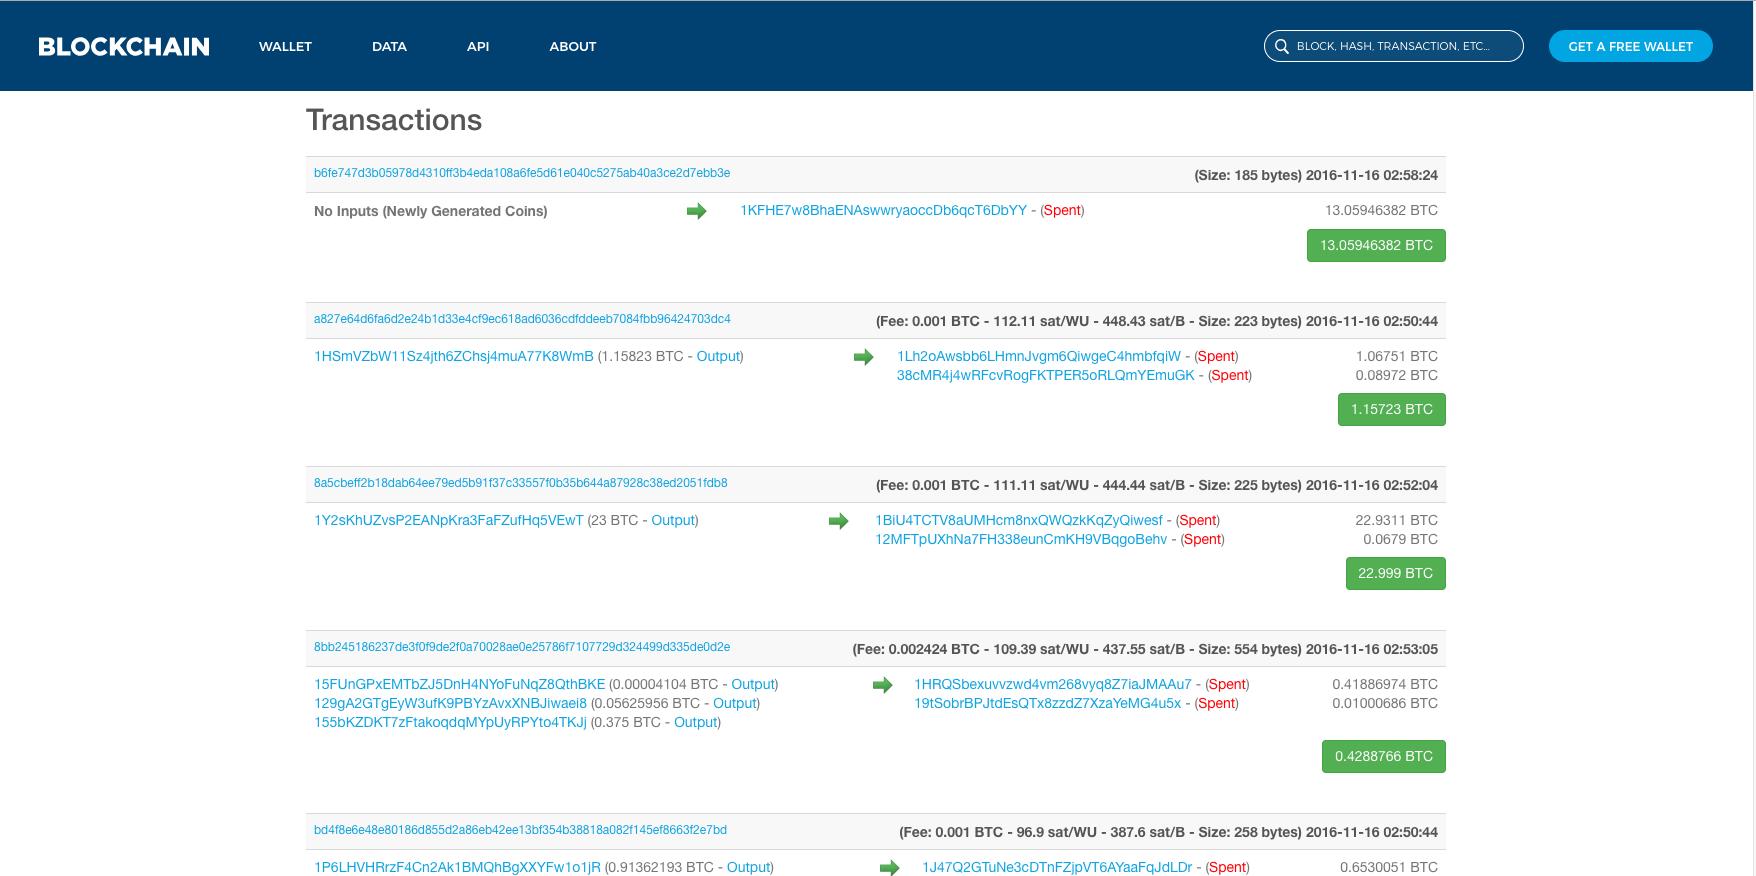 Blockchain block transactions